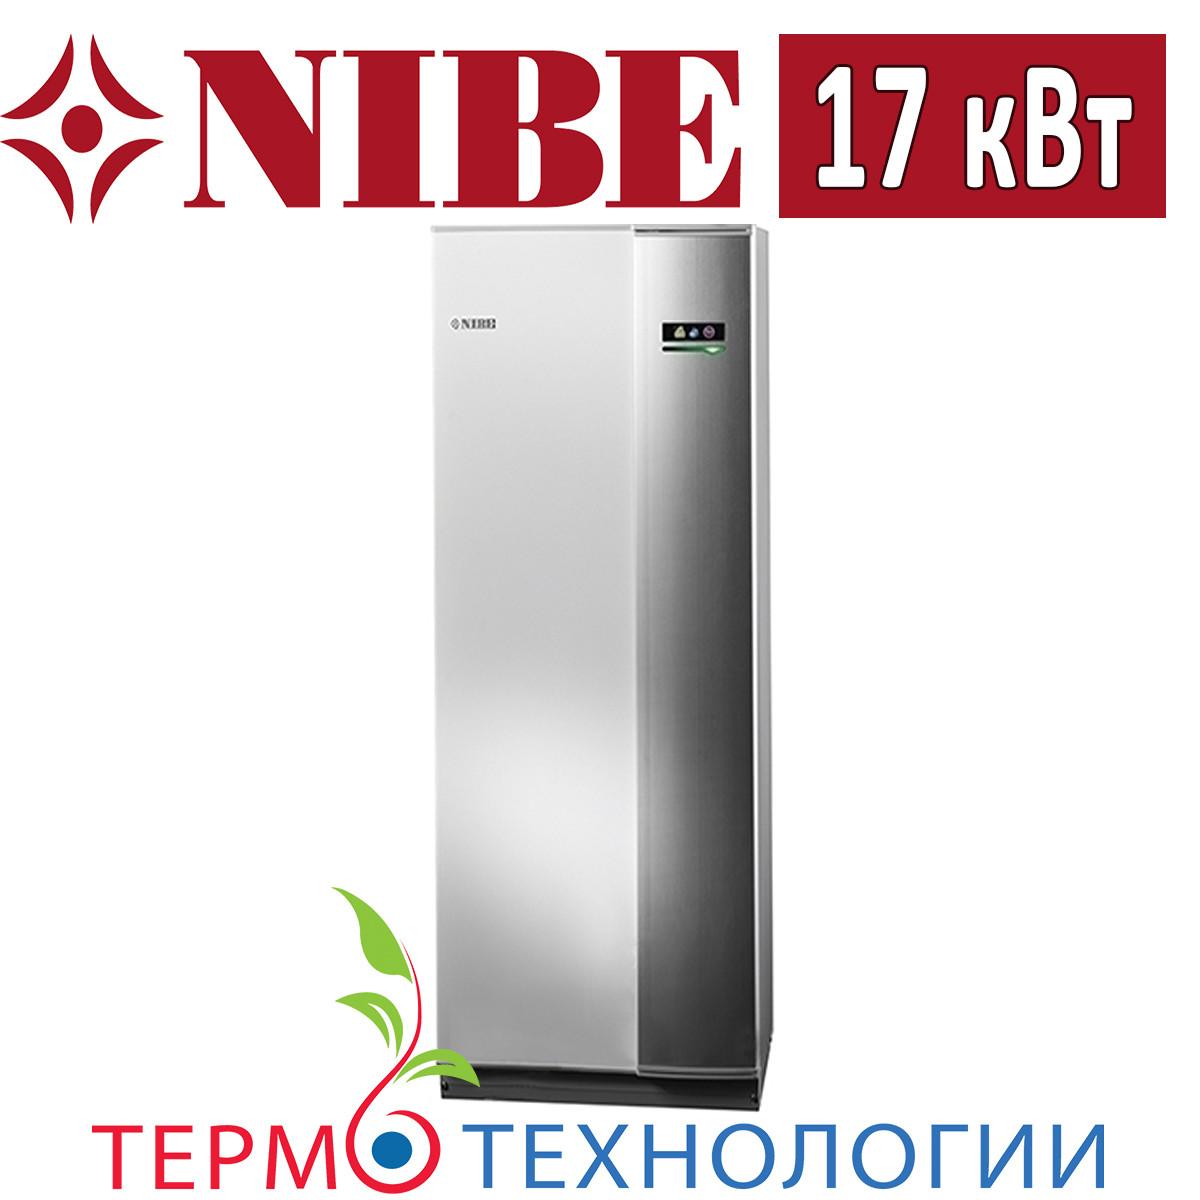 Тепловой насос грунт-вода Nibe F1145 17 кВт, 380 В